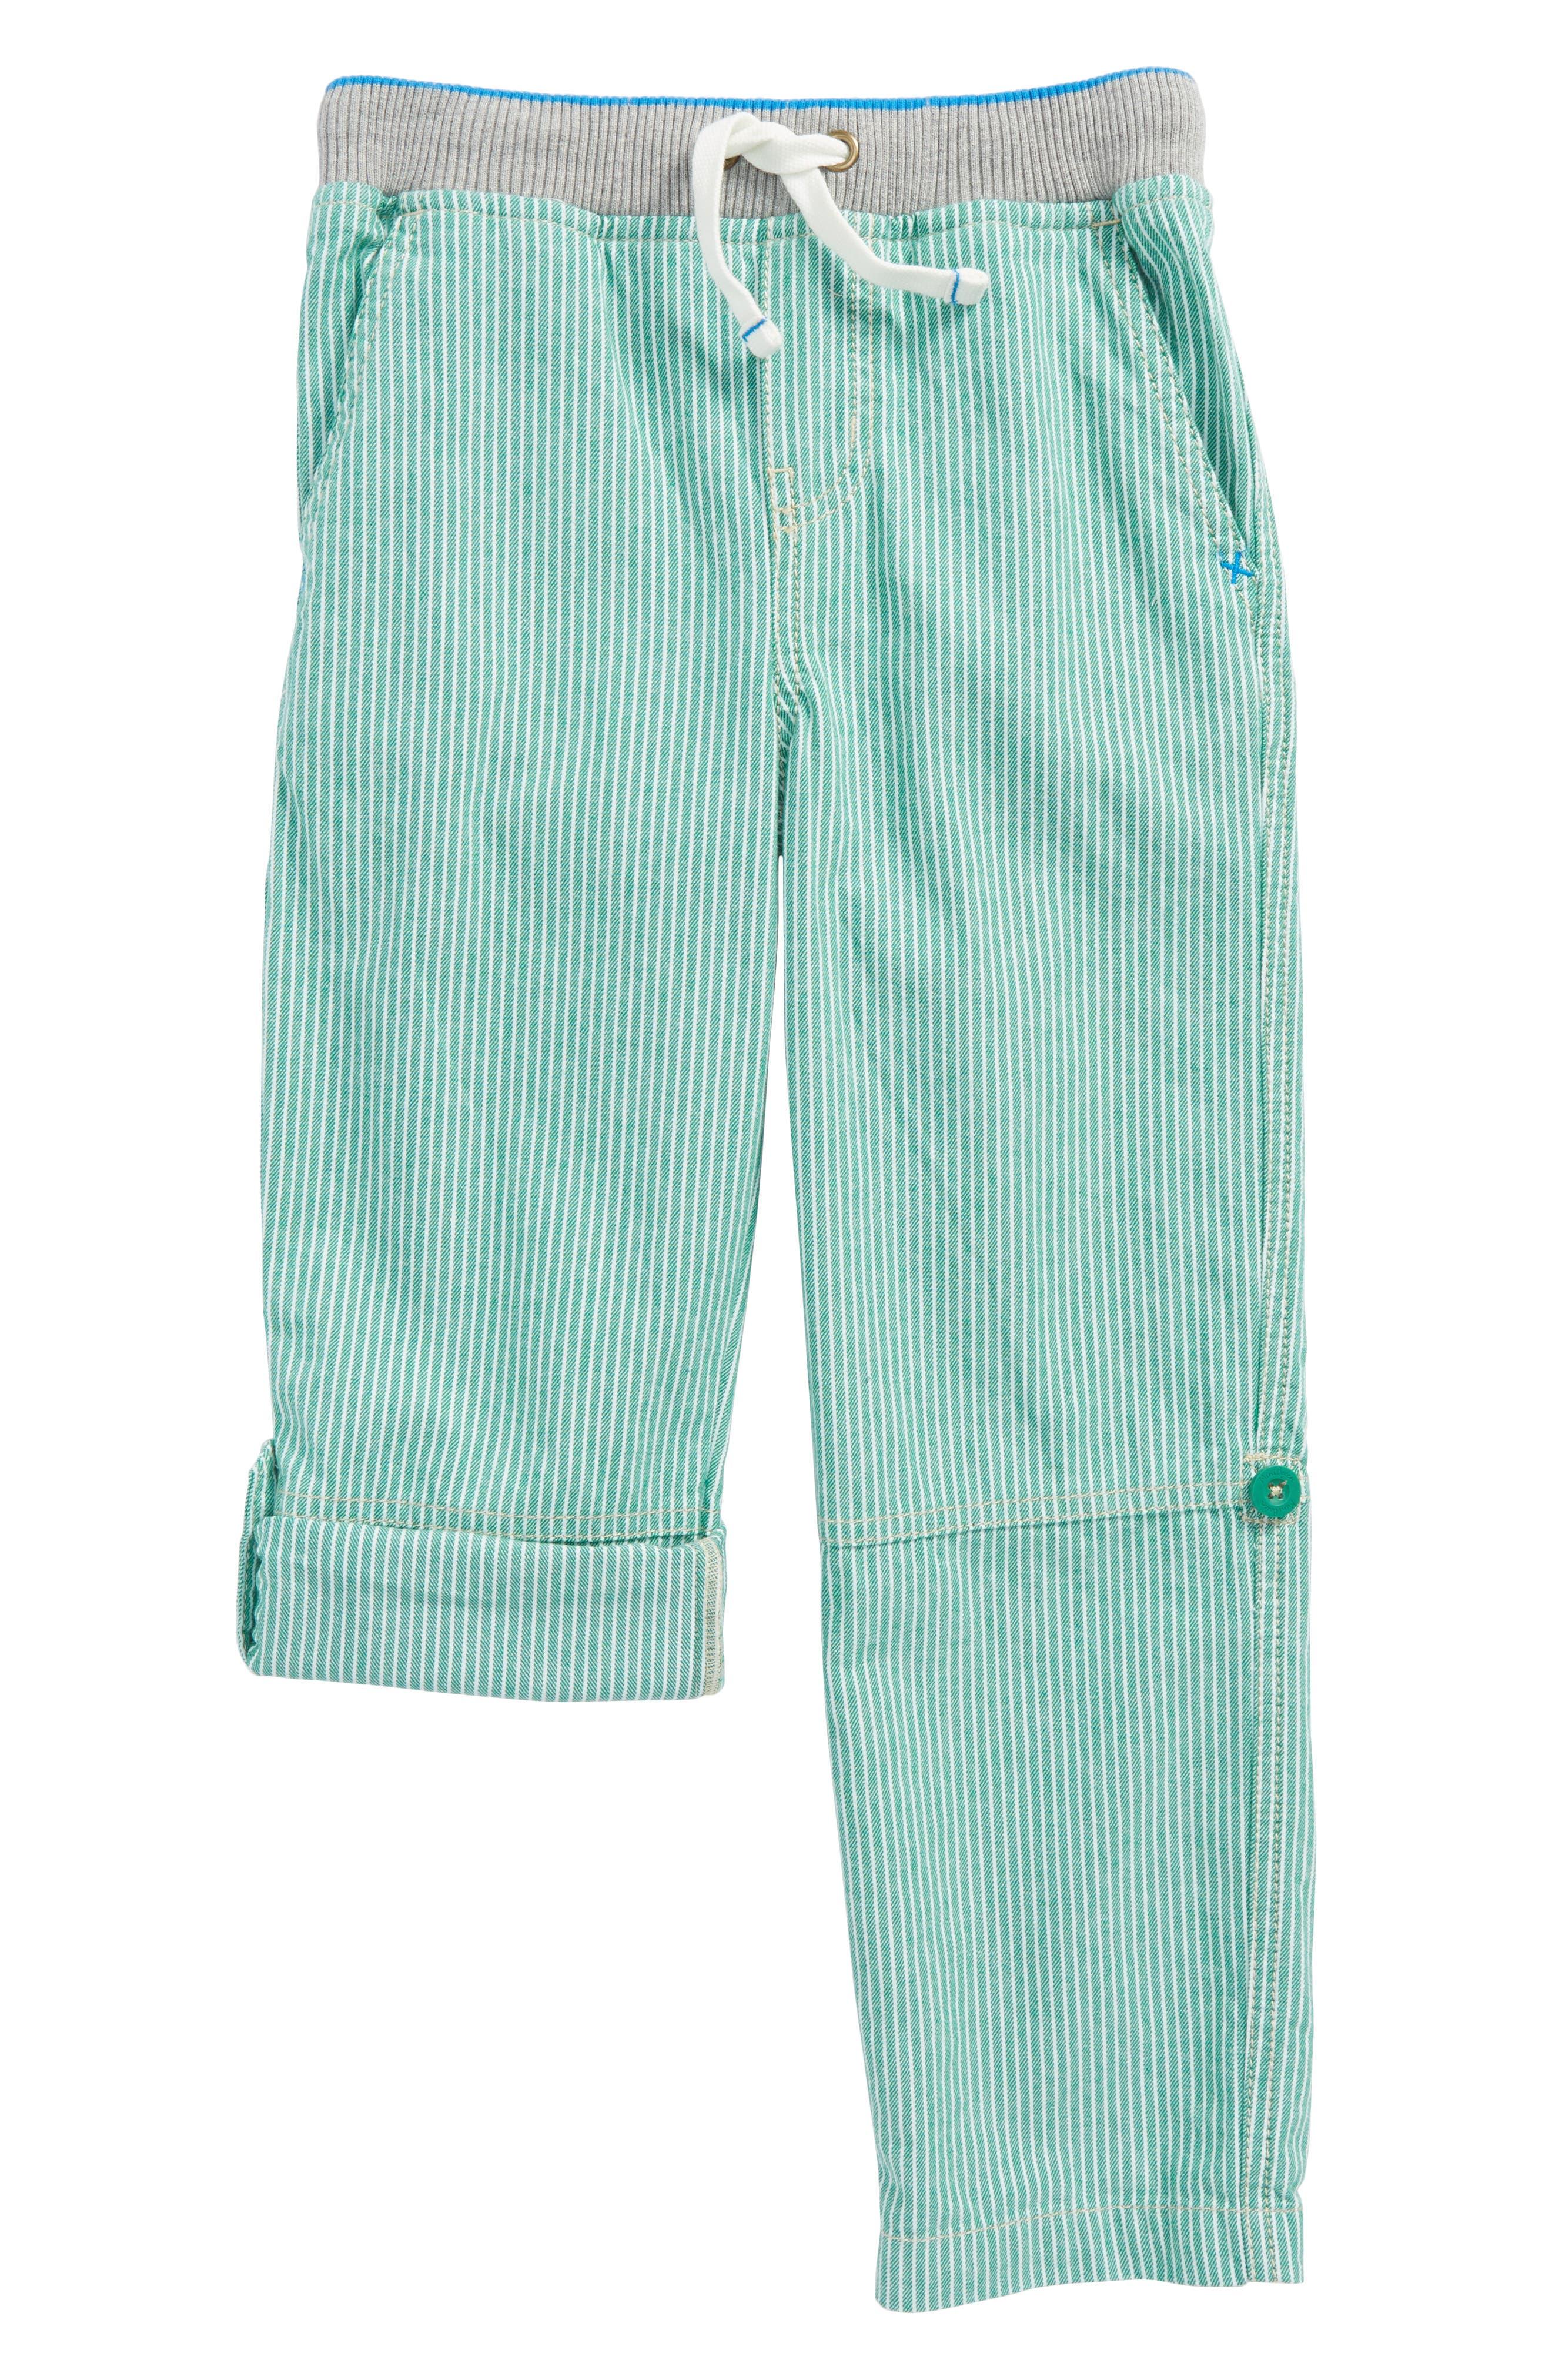 Surf Roll-Up Pants,                         Main,                         color, Moringa Green/ Ecru